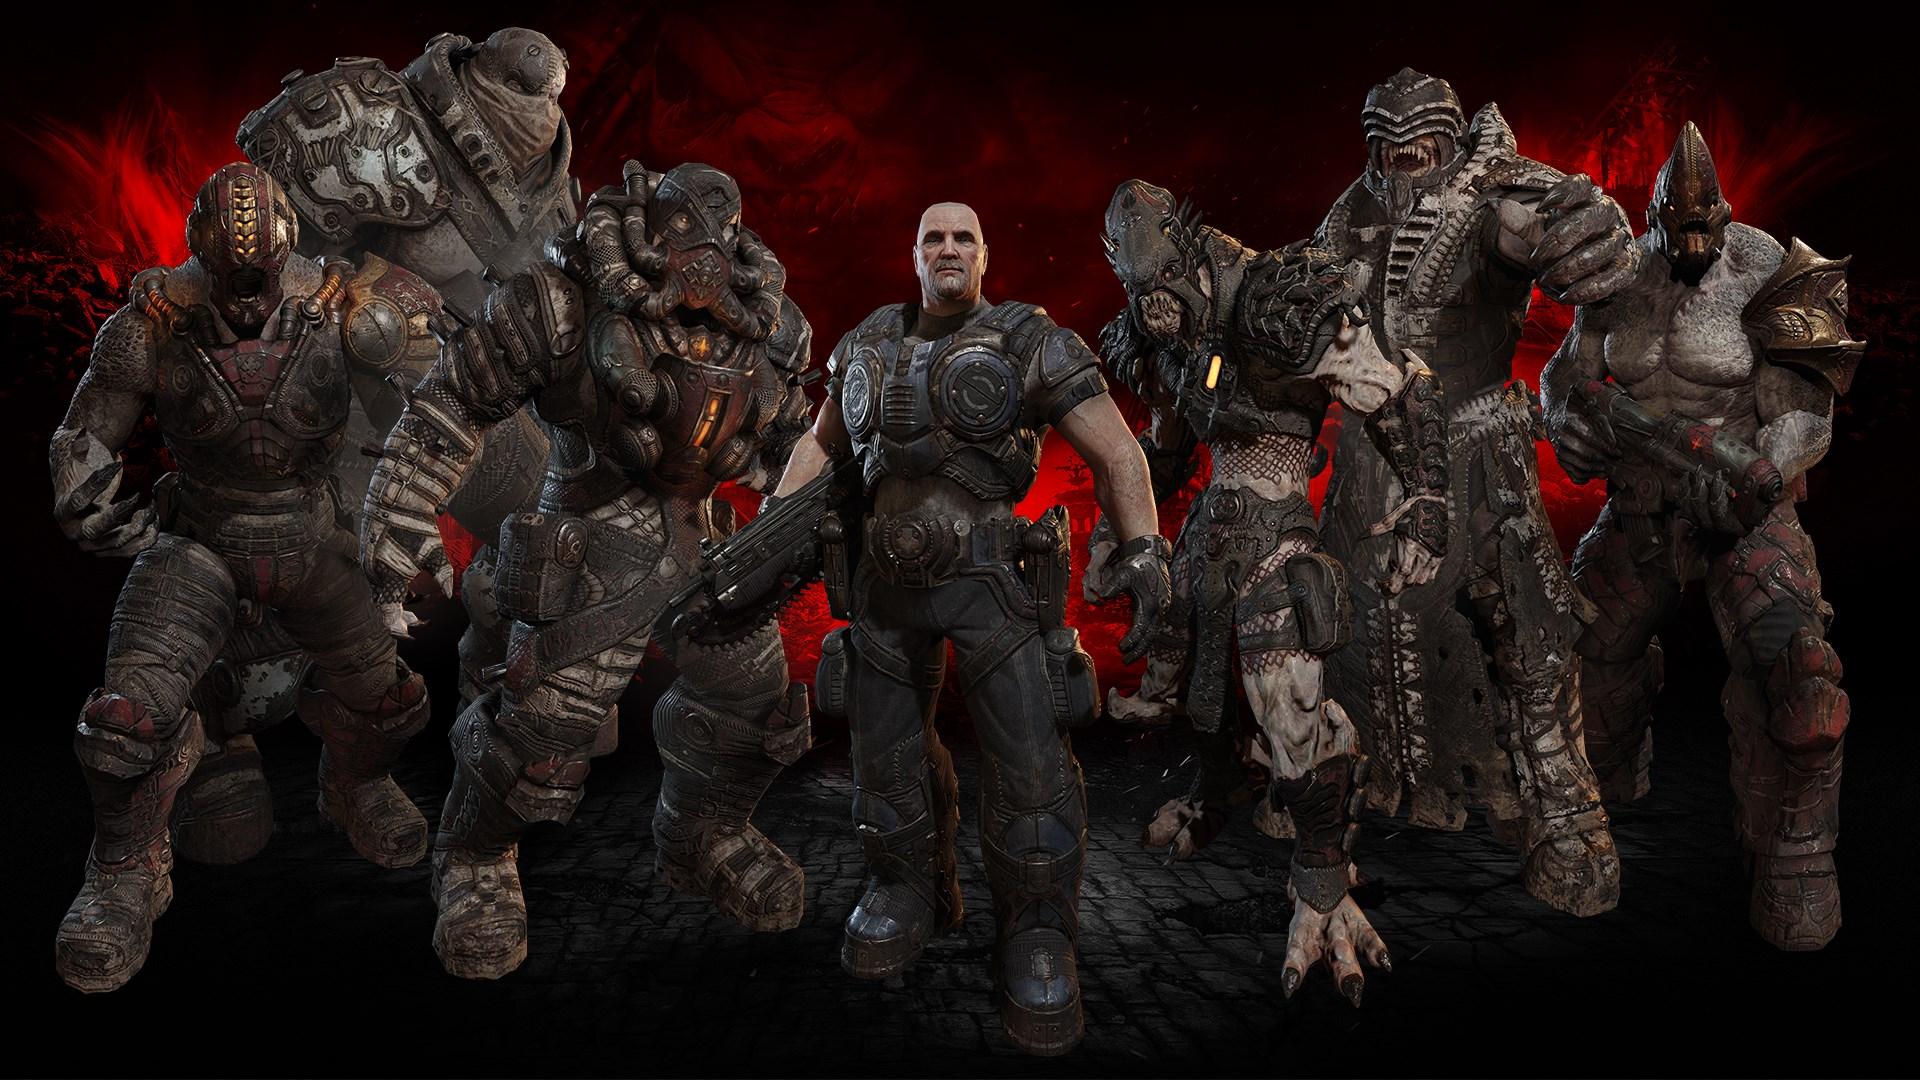 Buy Gears of War: Ultimate Edition Character Pack - Microsoft Store en